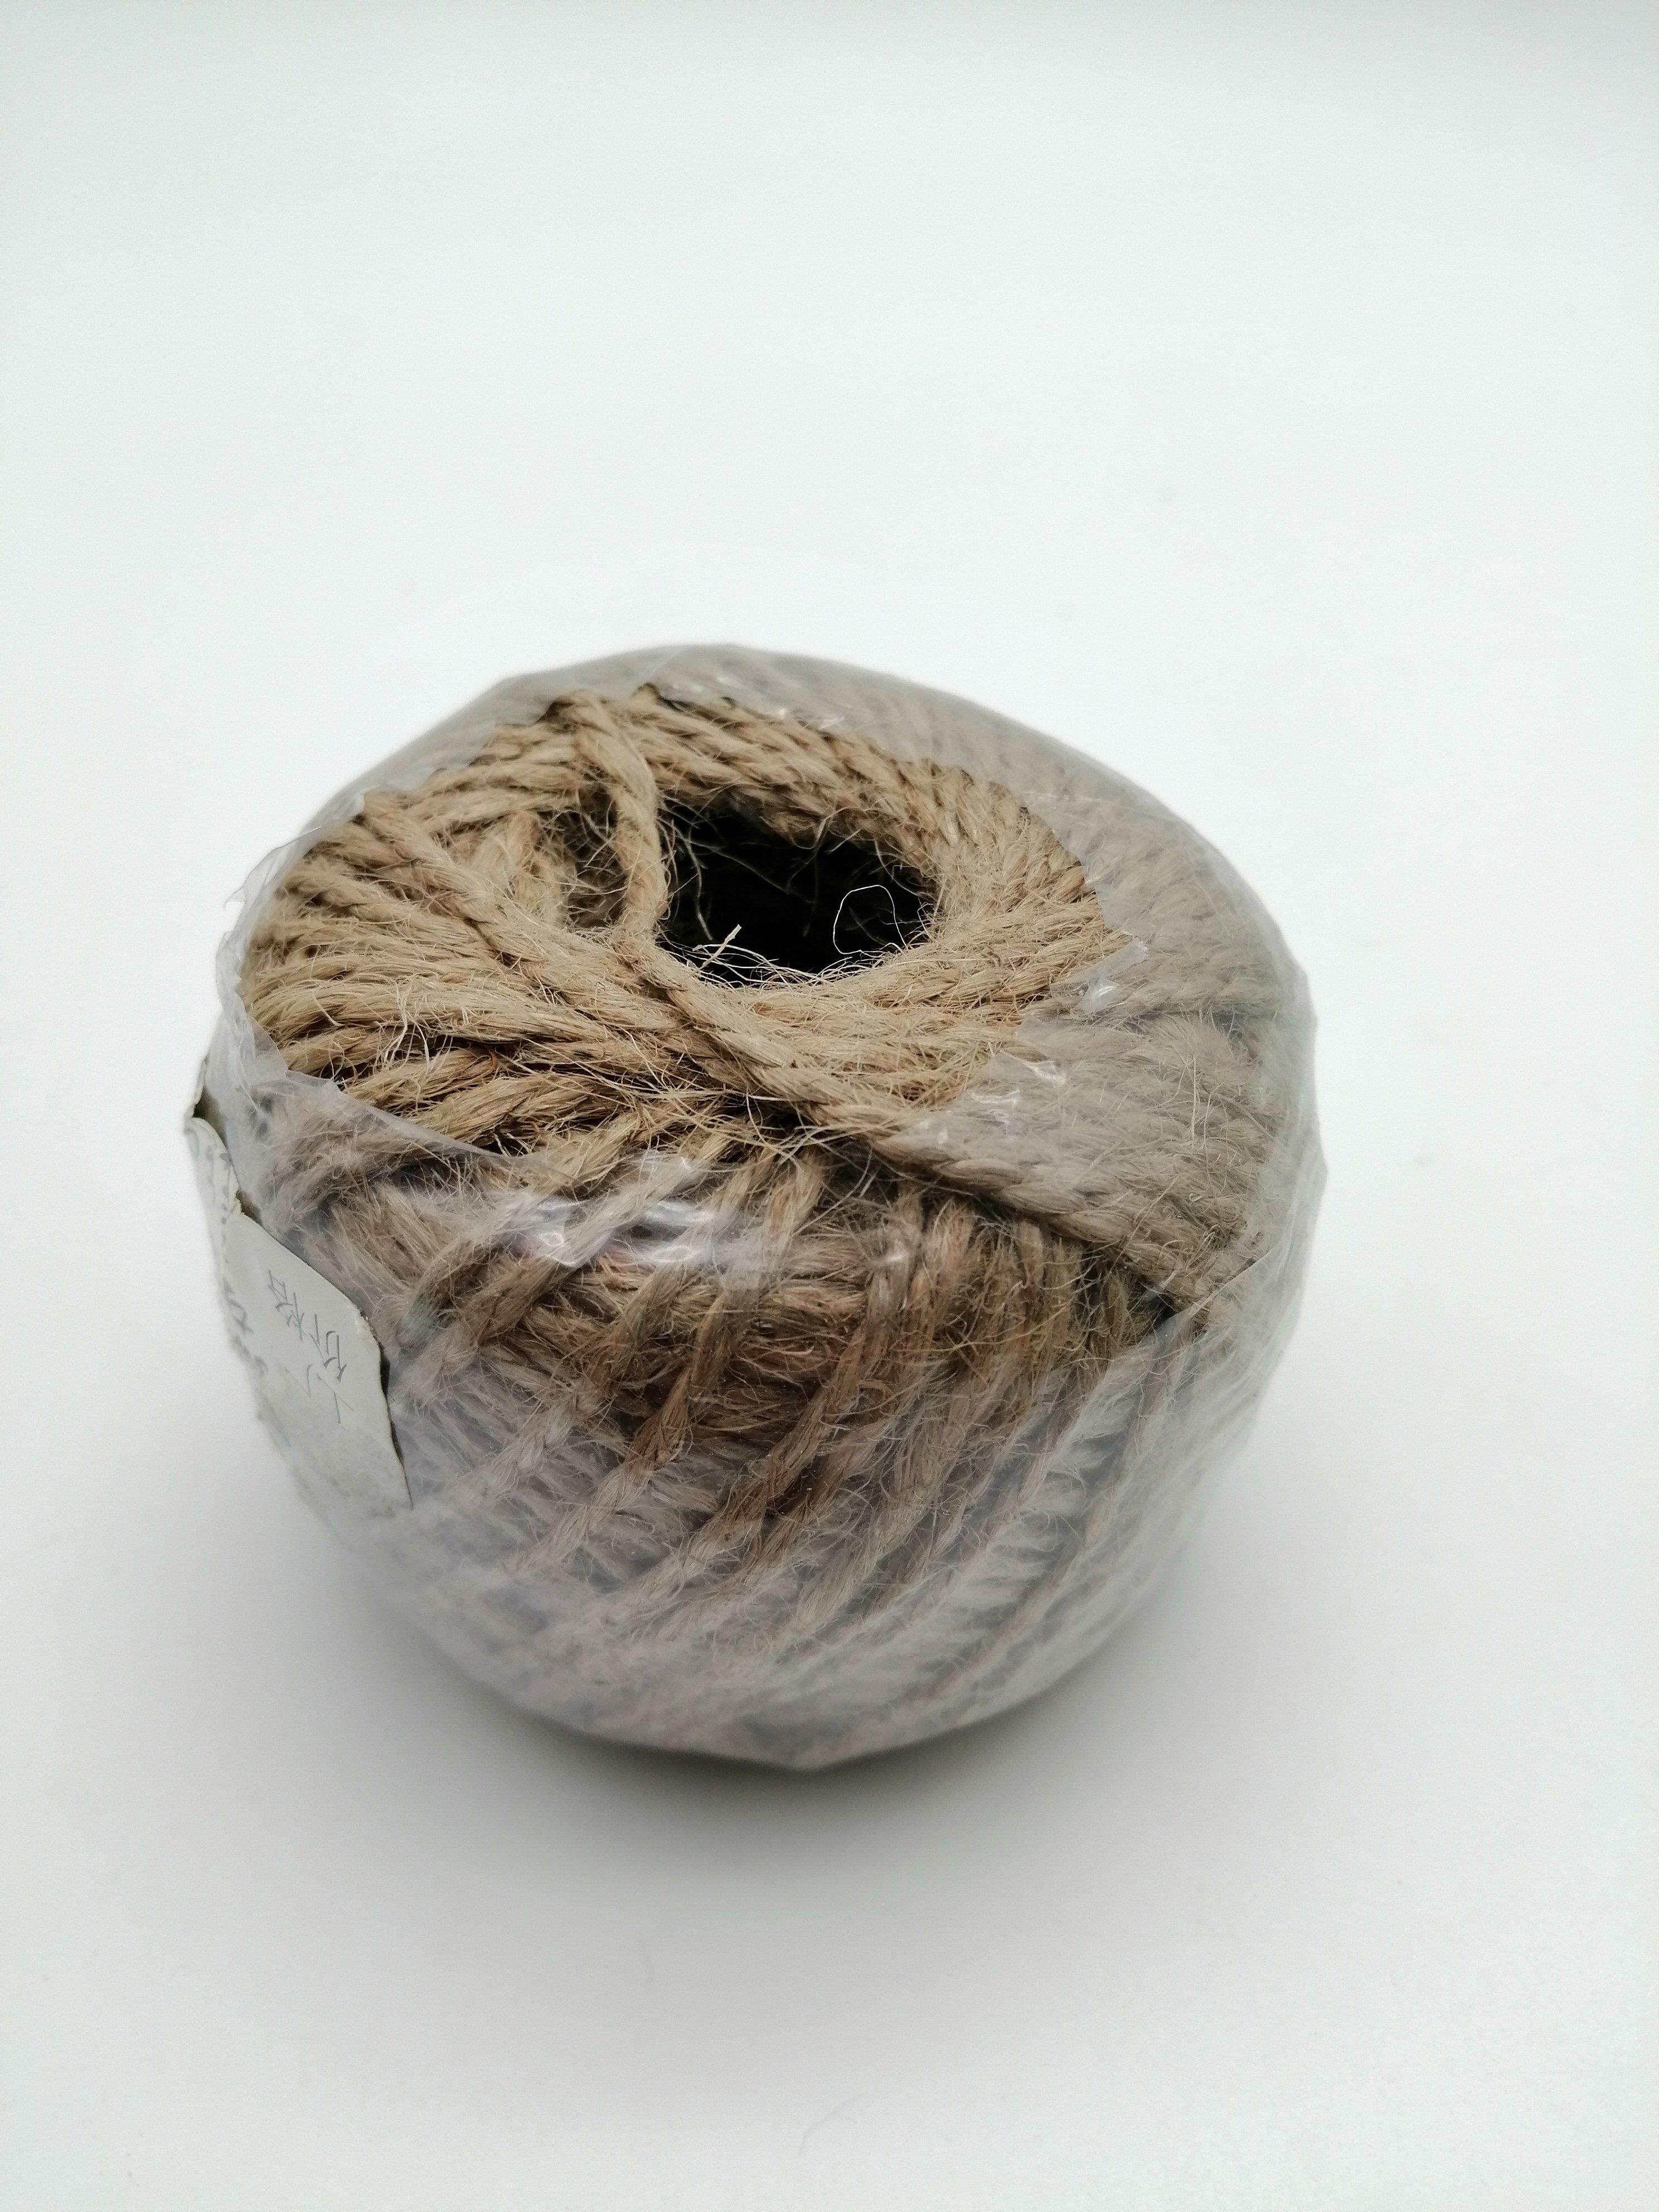 natural twine ball, jute twine twisted jute yarn